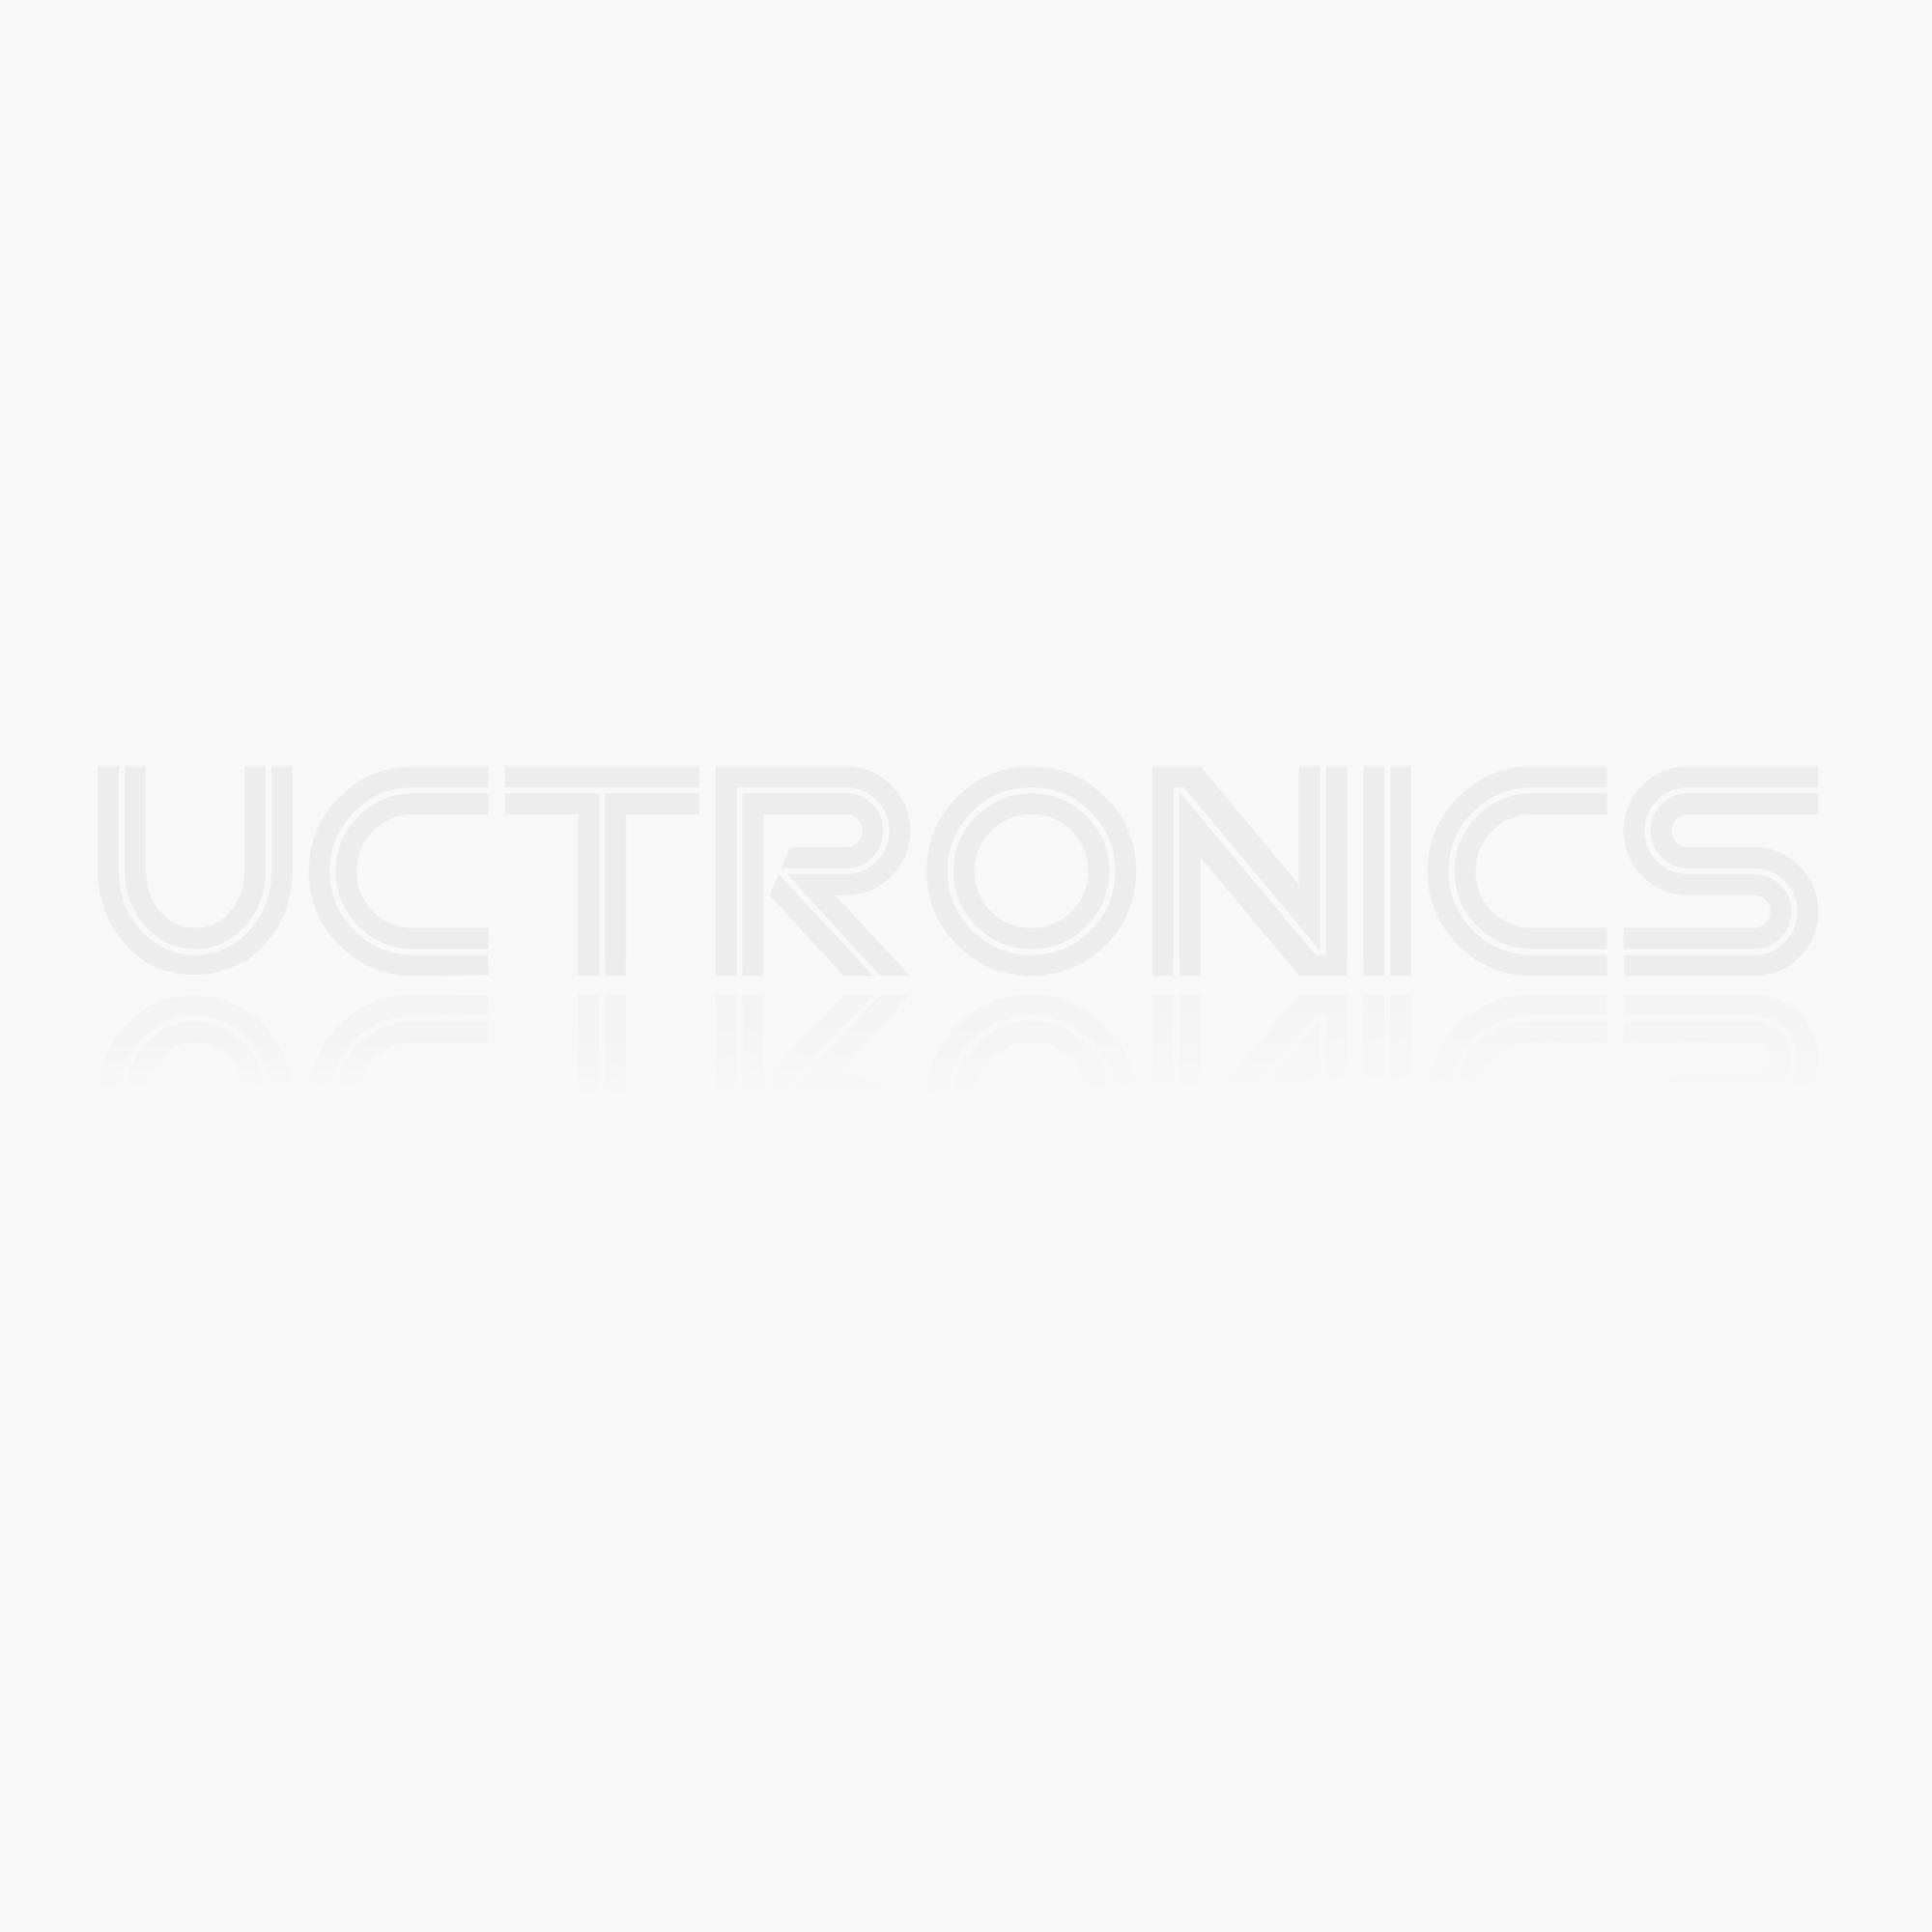 DRV8825 Stepper Motor Driver Module 2.5A for CNC 3D Printer RepRap StepStick